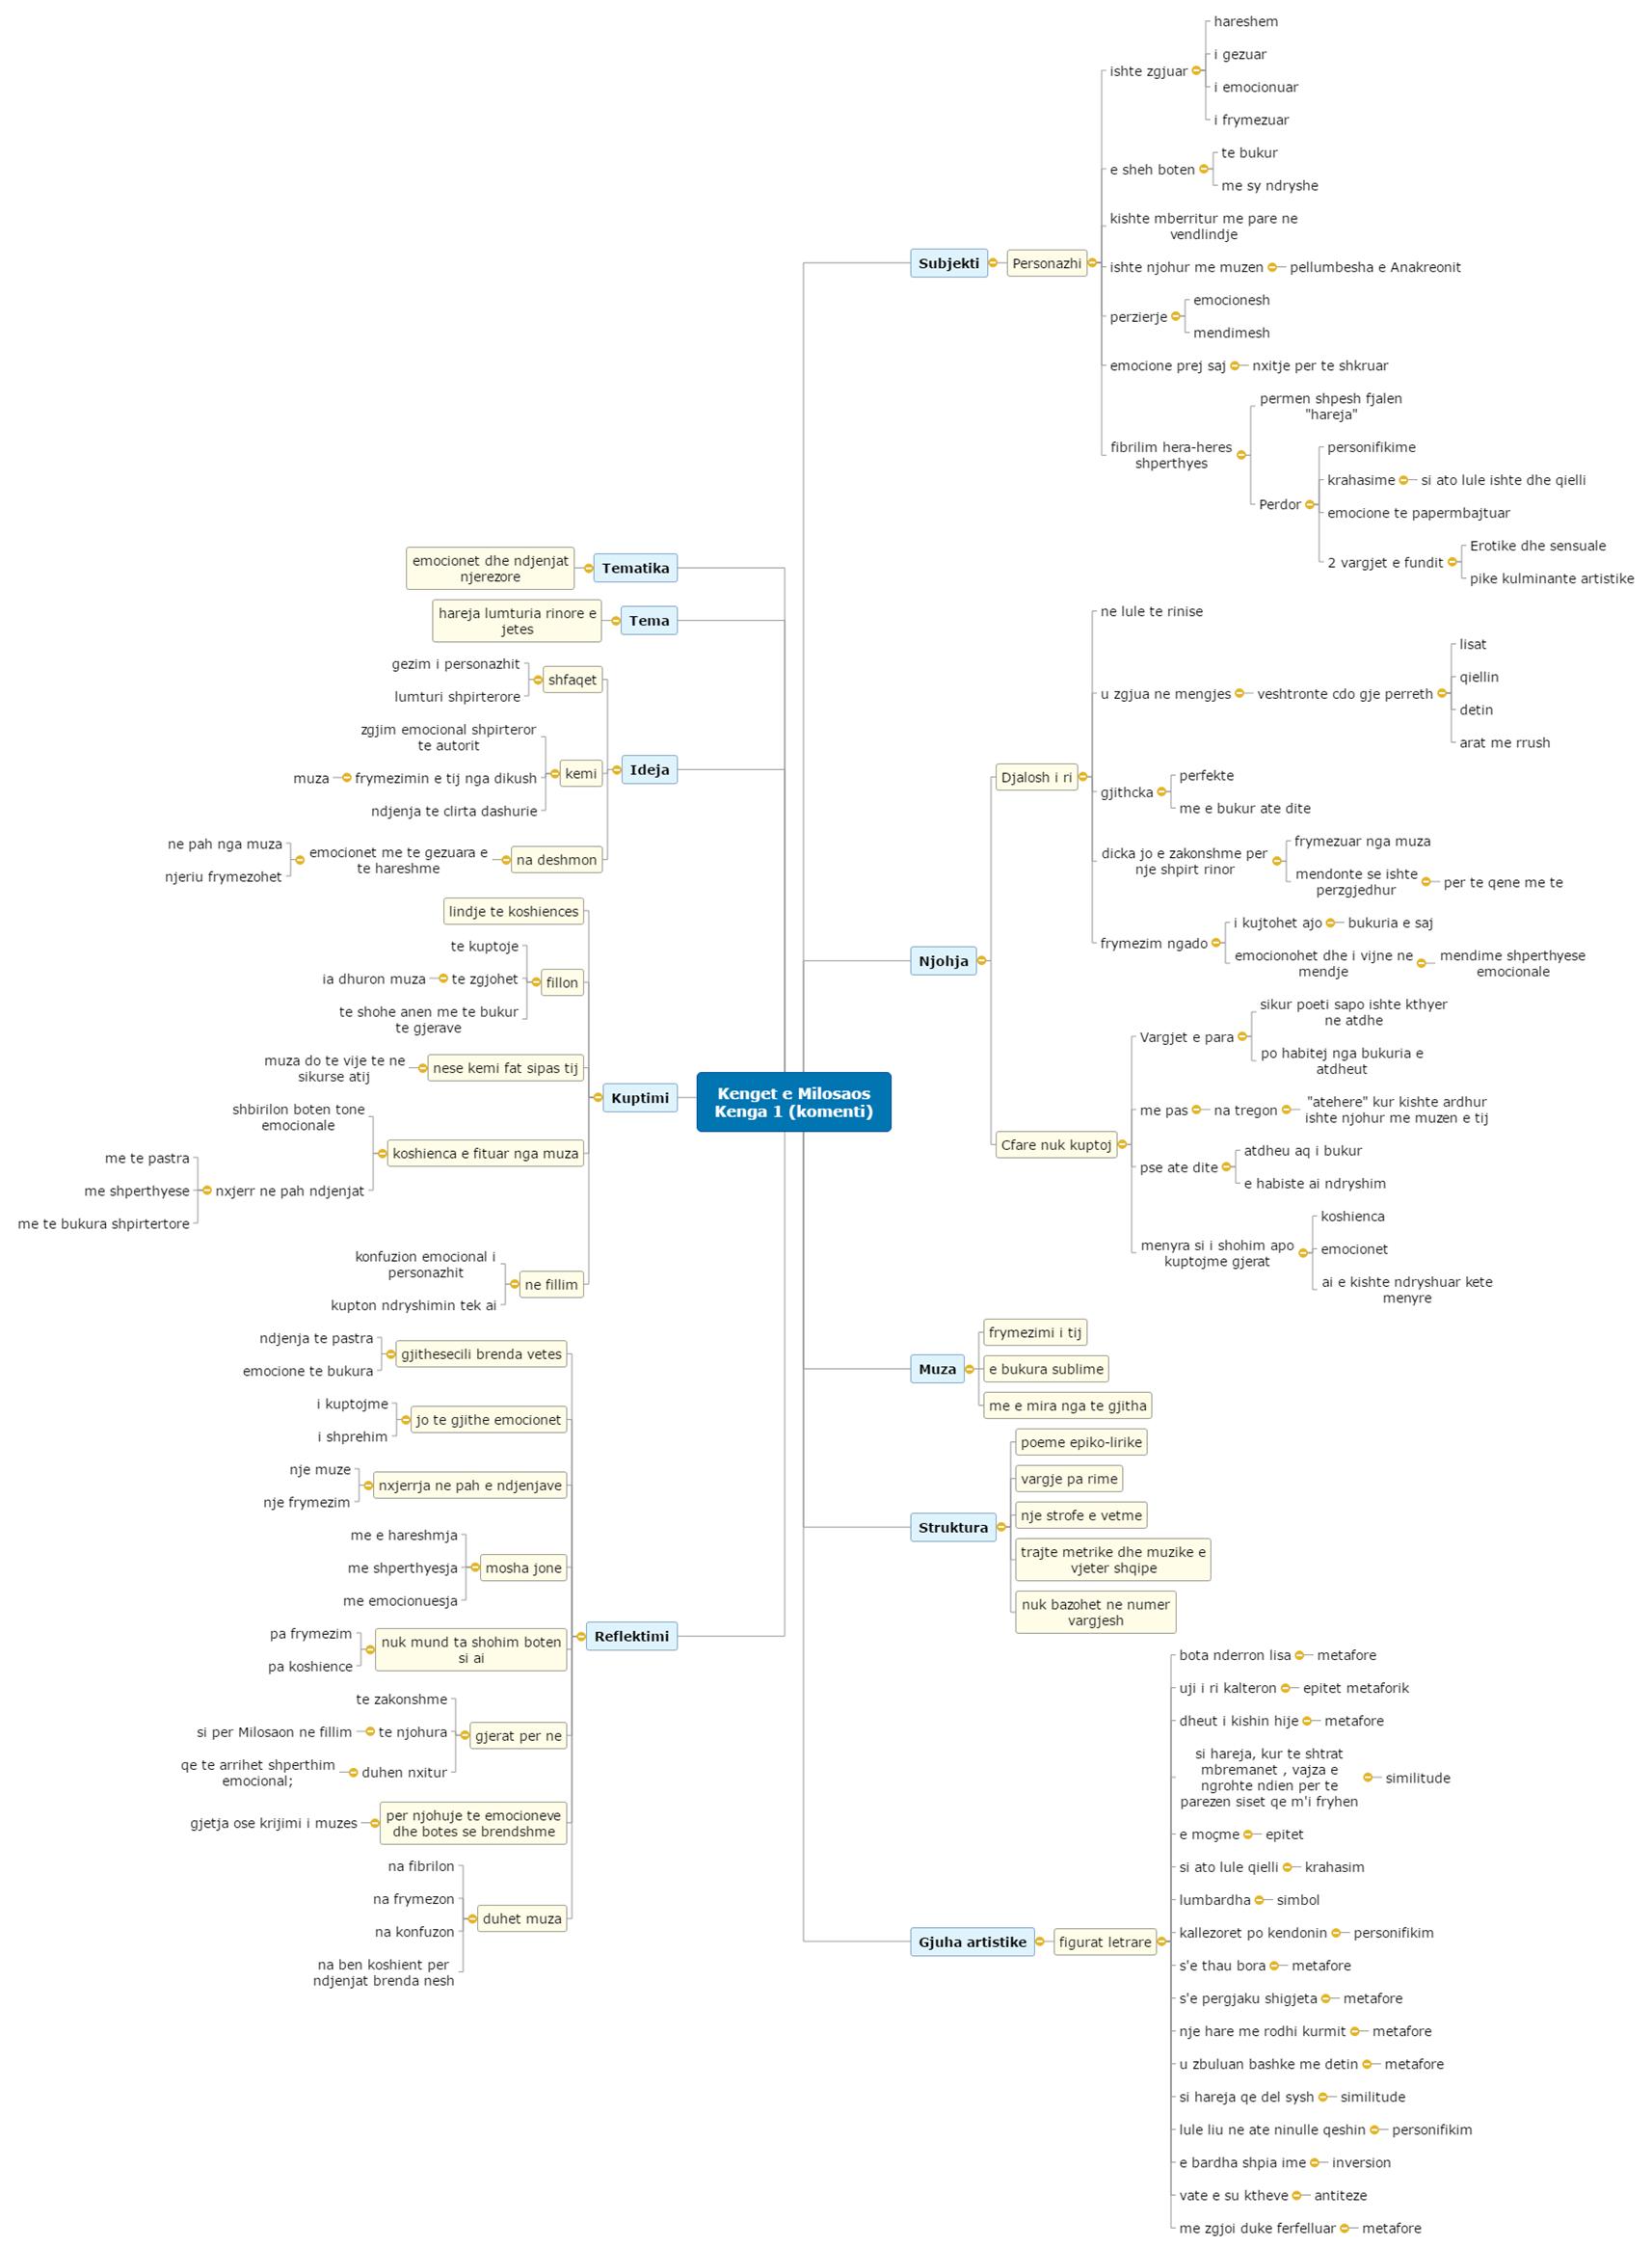 Kenget e Milosaos (komenti) Mind Map